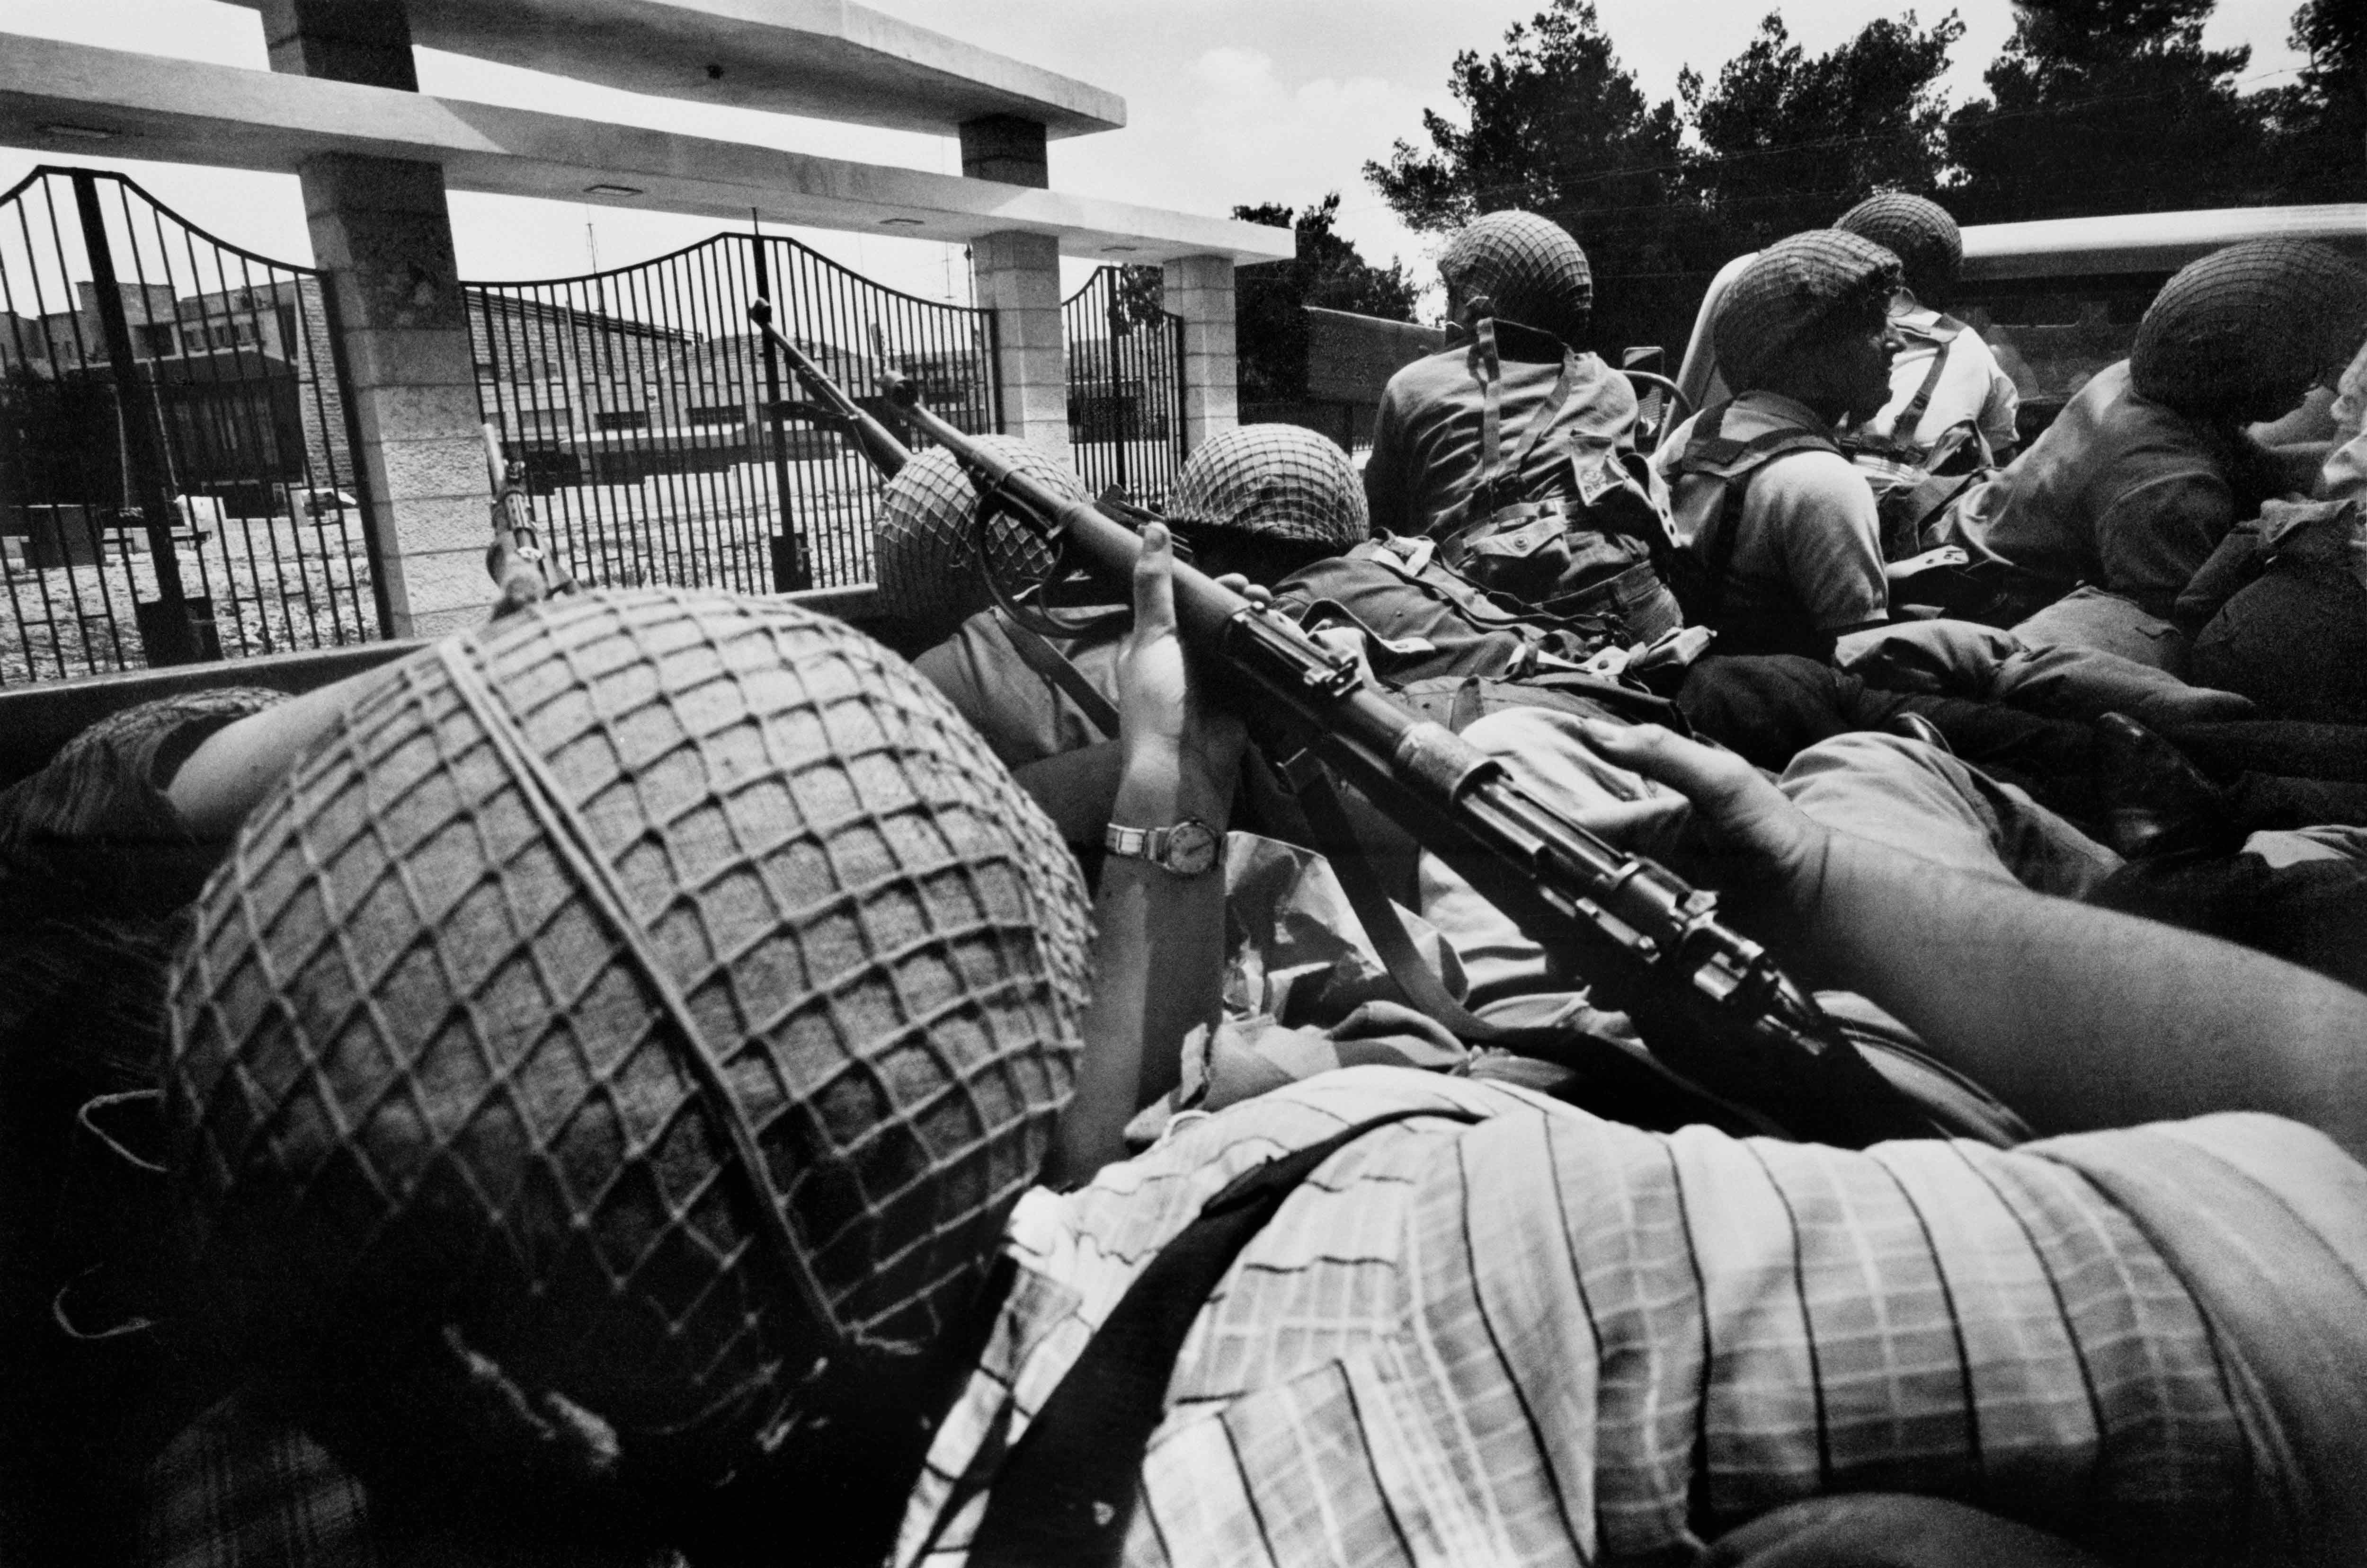 Soldiers in Salah a-Din street, Jerusalem, The Six-Day War, June 1967